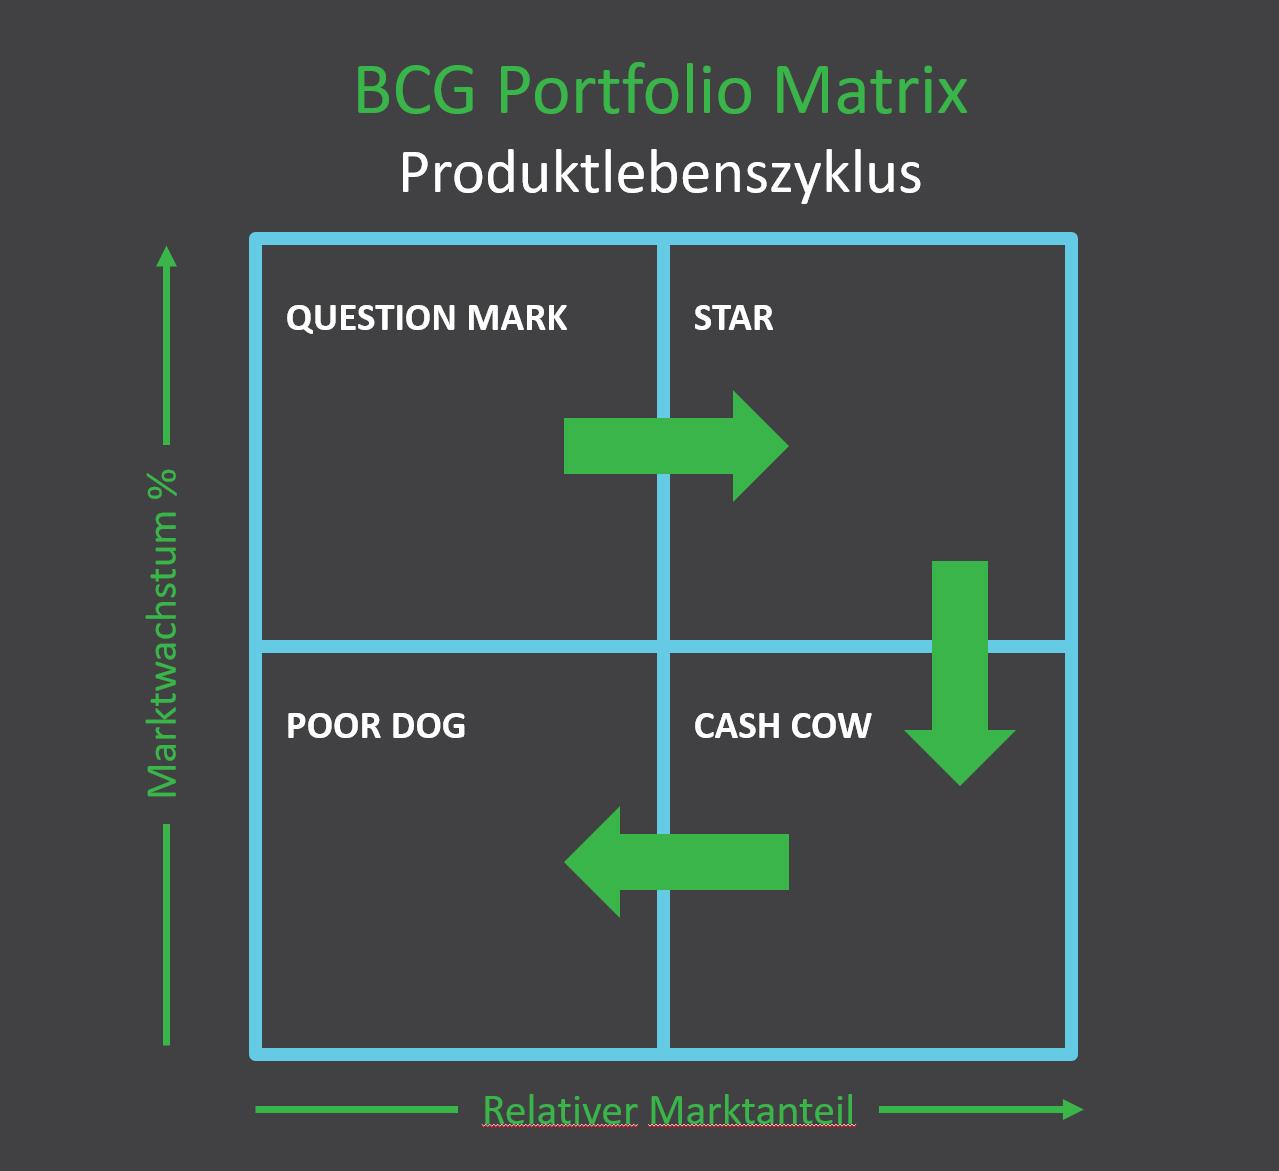 BCG Portfolio Matrix Produktlebenszyklus